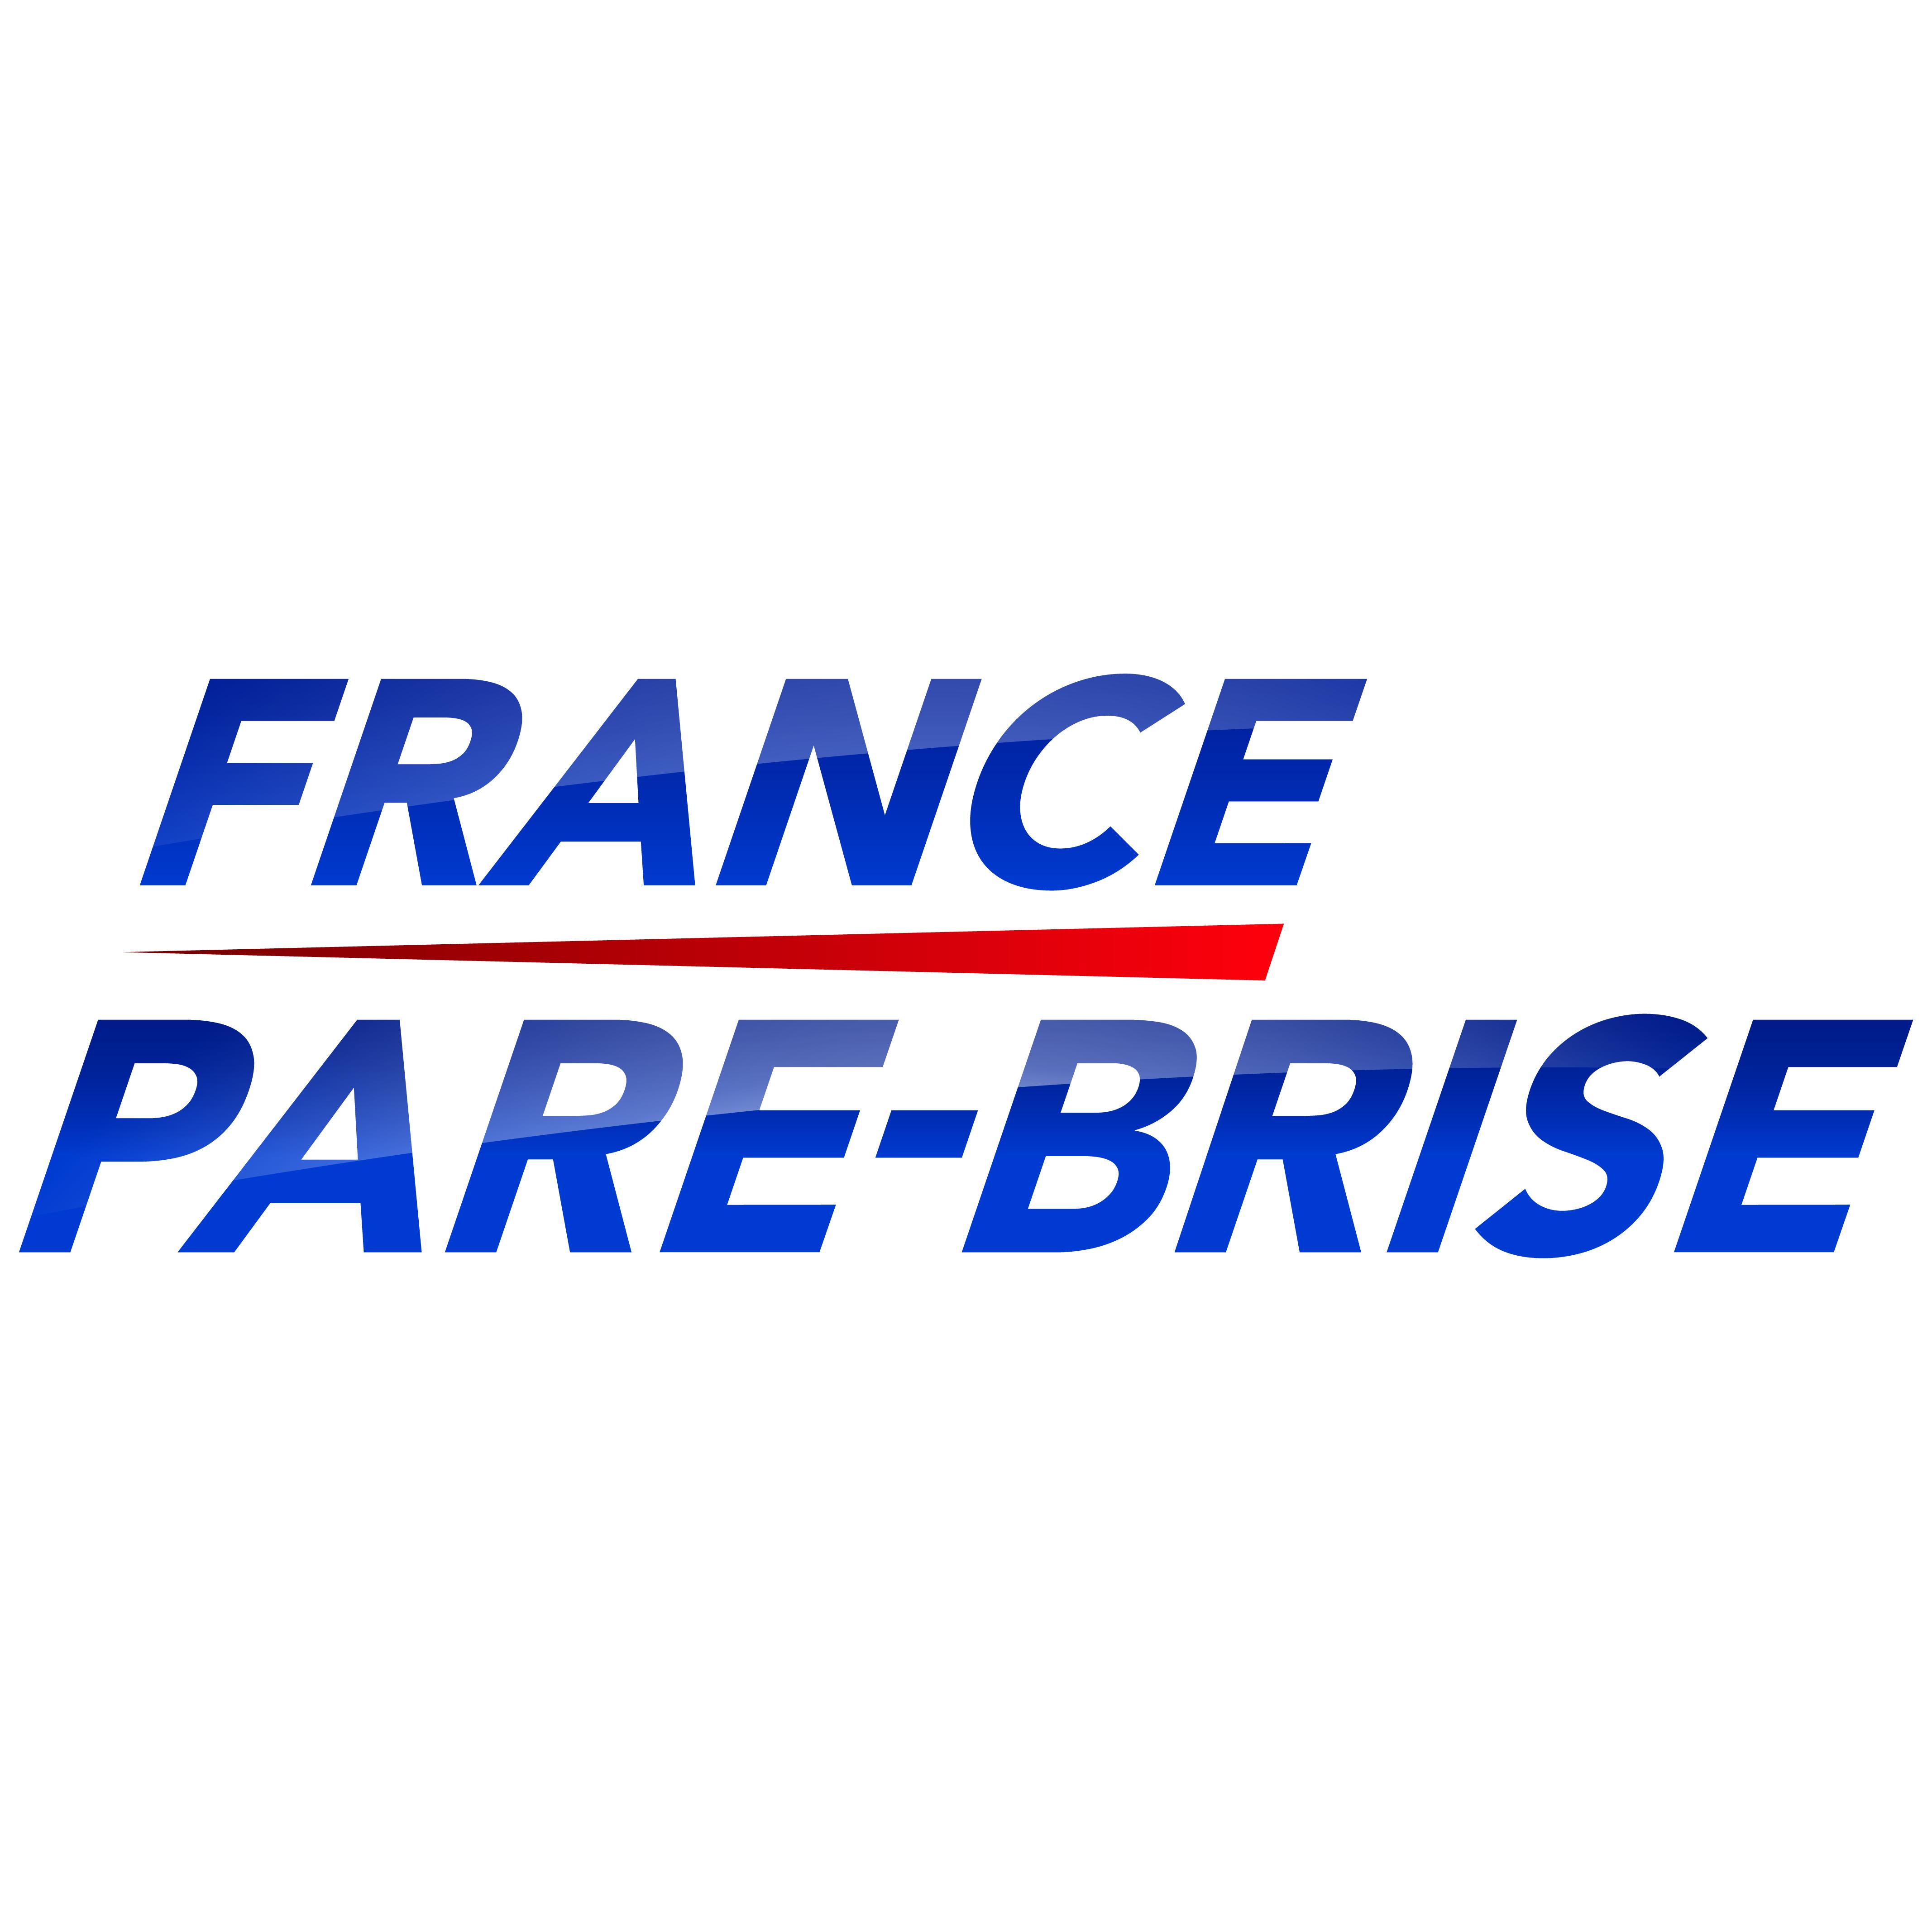 France Pare-Brise REIMS vitrerie (pose), vitrier